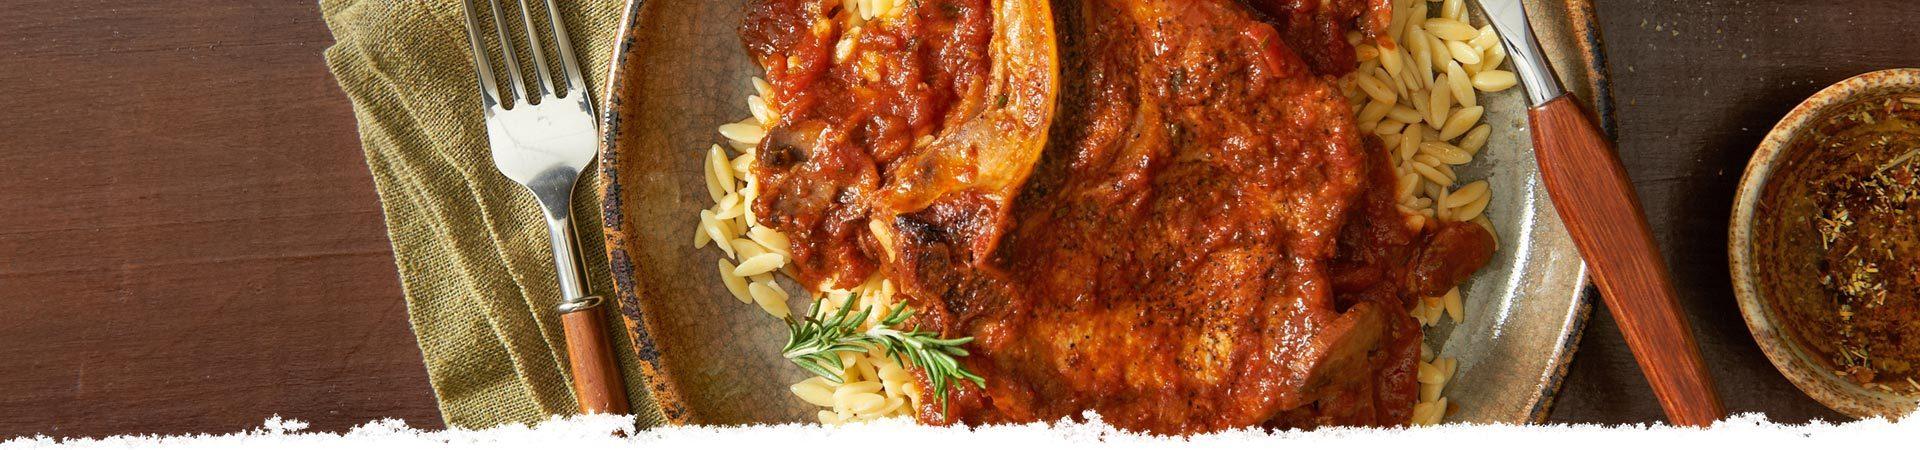 Balsamic & Burgundy Braised Pork Chops